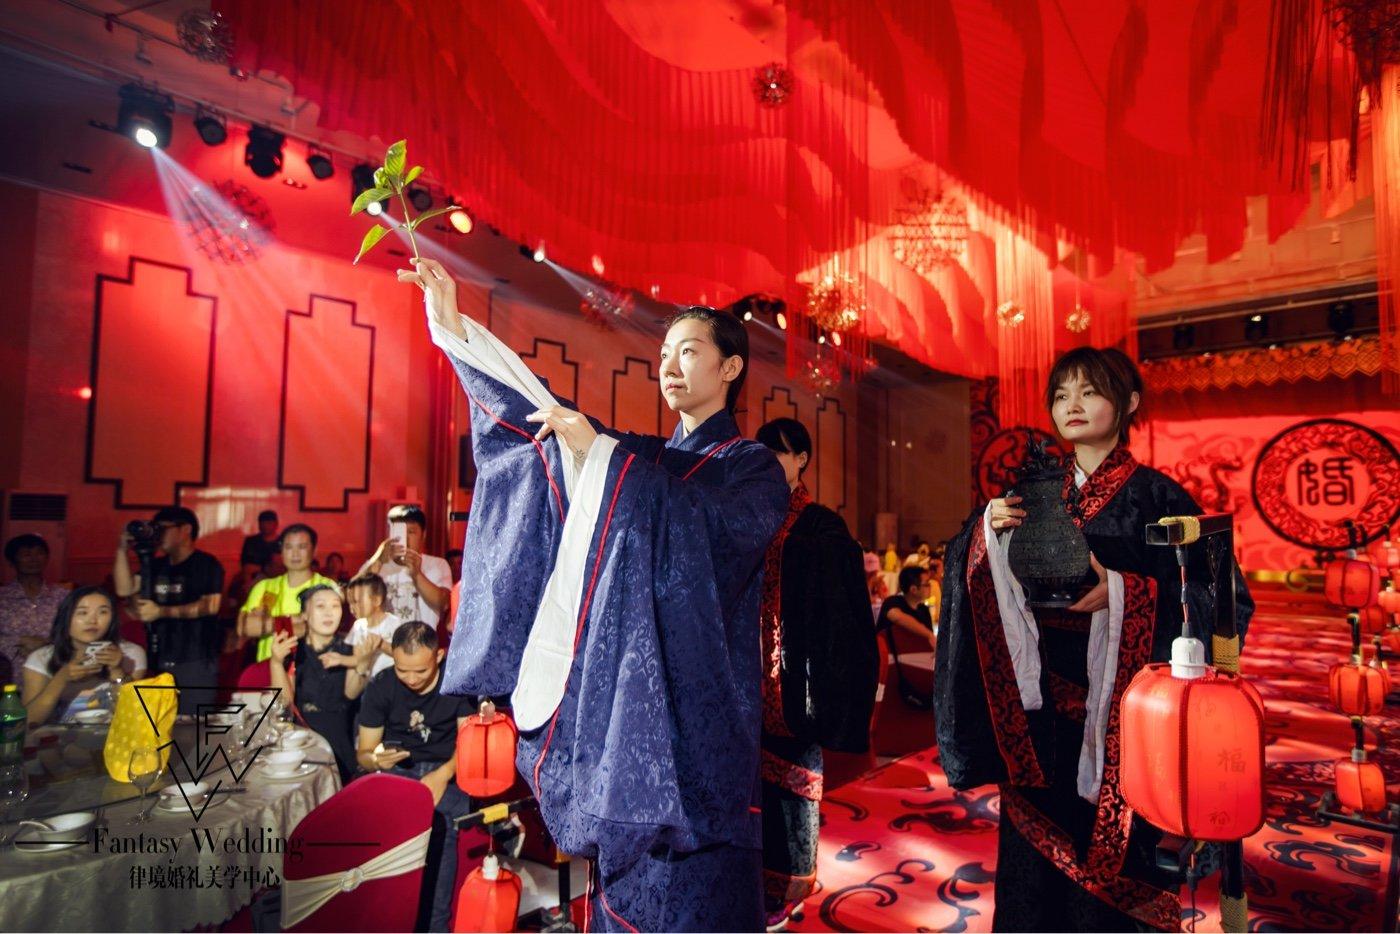 「Fantasy Wedding」&汉式婚礼11